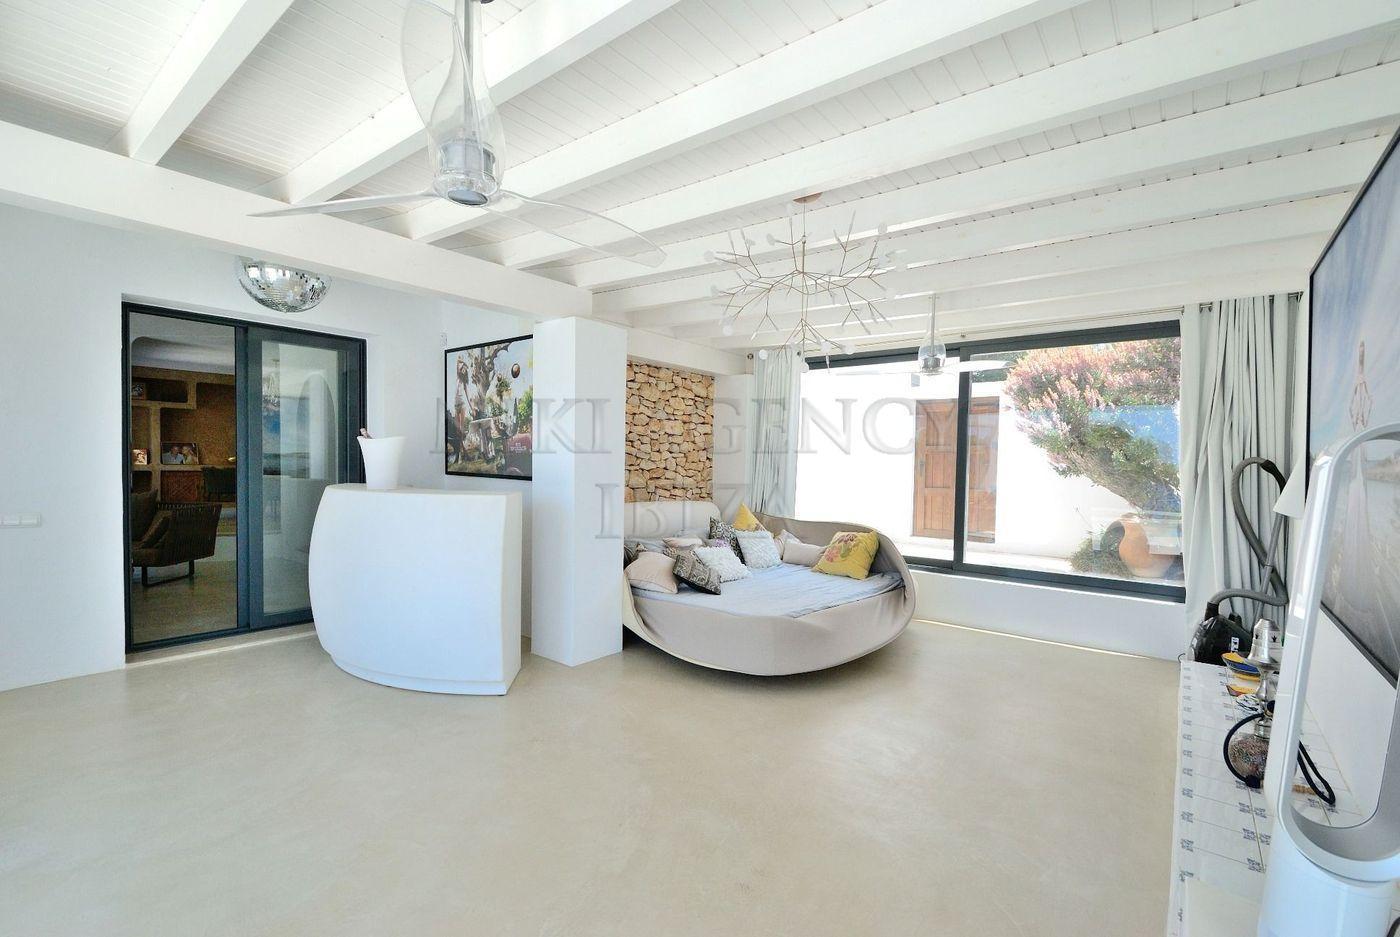 12. House for sale in Sant Josep de sa Talaia Ibiza - Fantastic 4 Bed Villa For Sale in Sant Josep de sa Talaia, Ibiza!